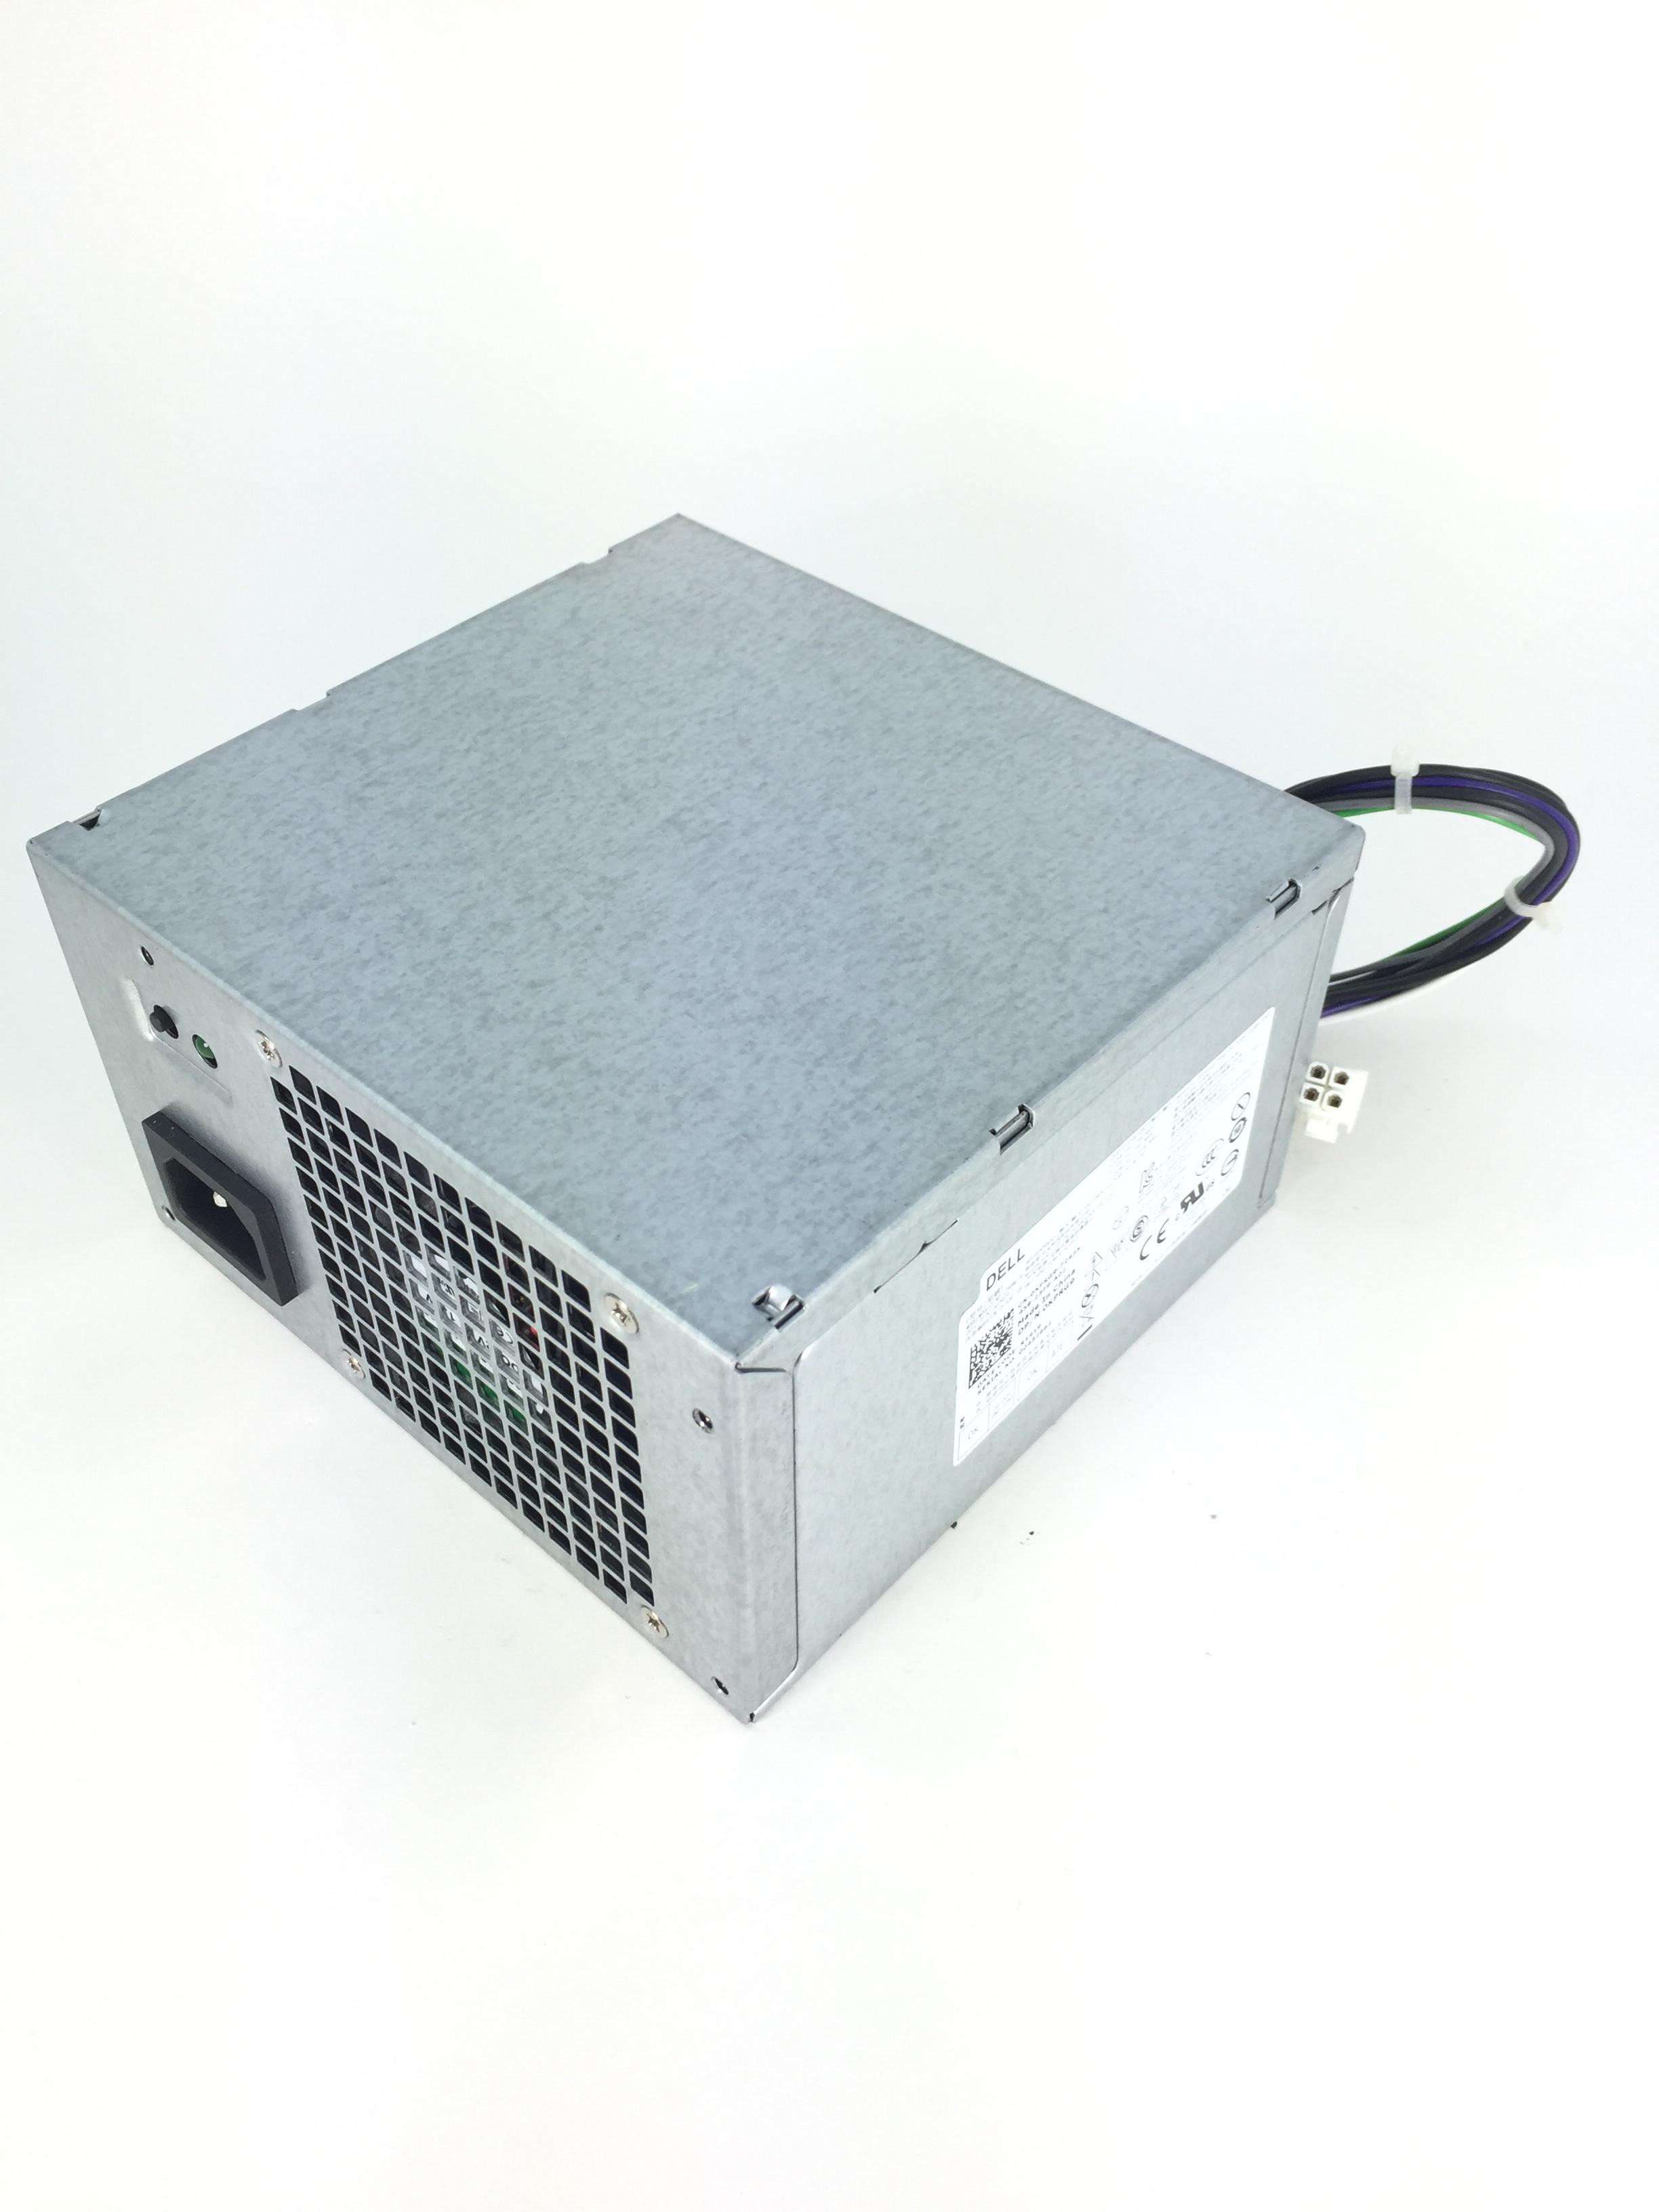 OPTIPLEX 3020 MT 290W POWER SUPPLY (KPRG9)